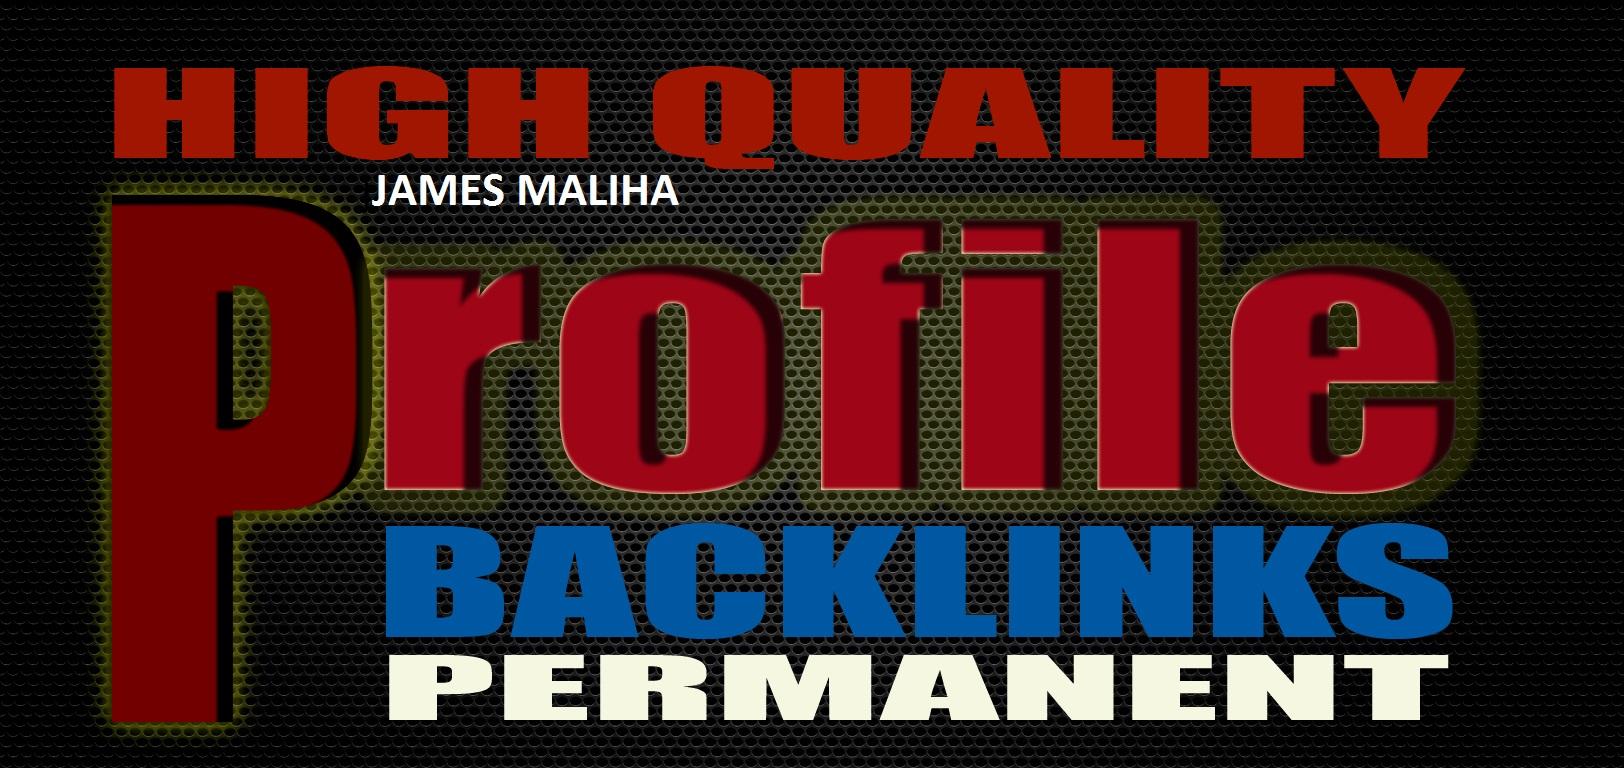 Create High Quality 55 Permanent Backlinks